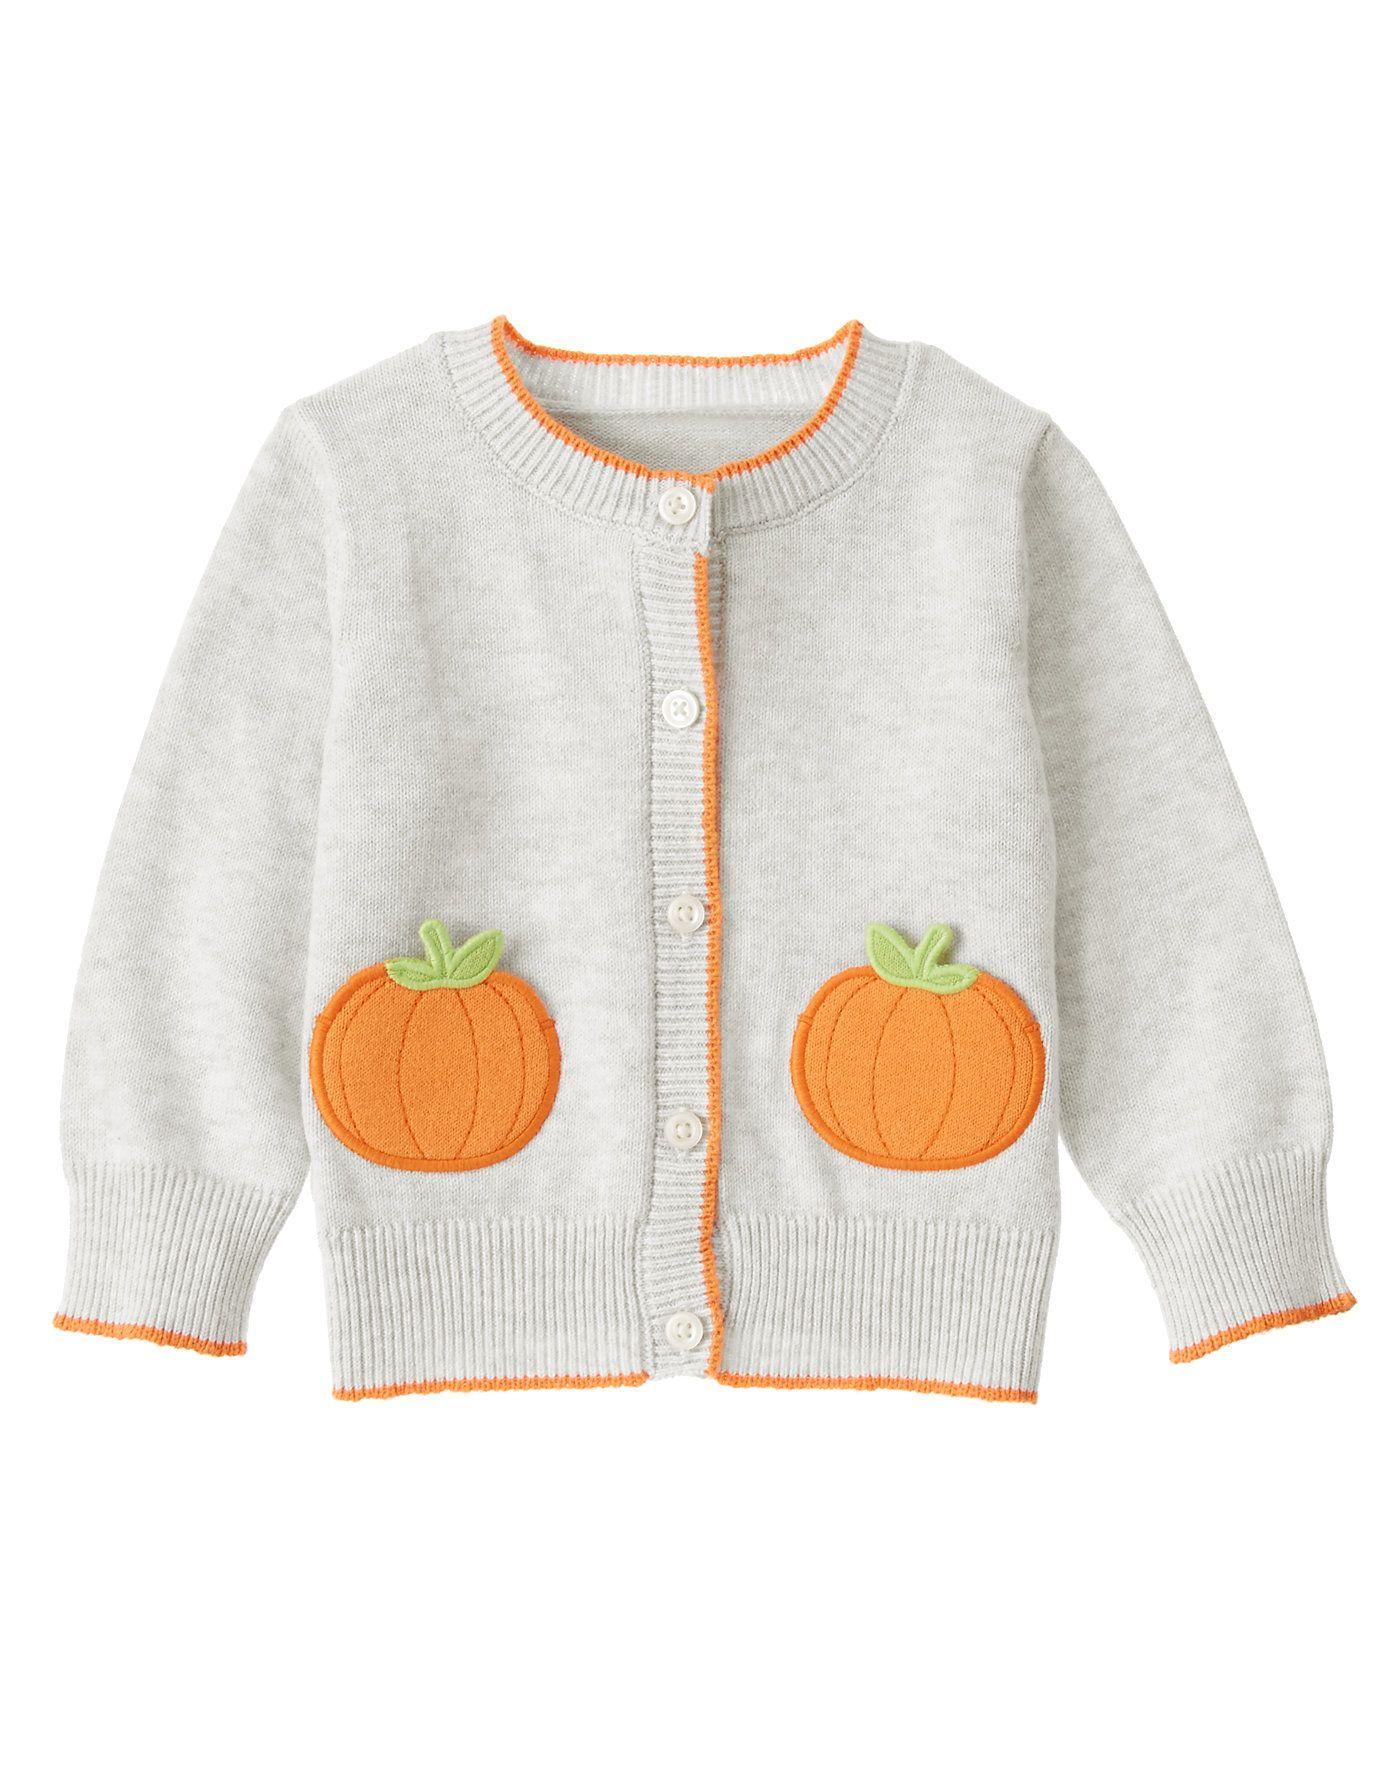 Pumpkin Pocket Cardigan at Gymboree Collection Name